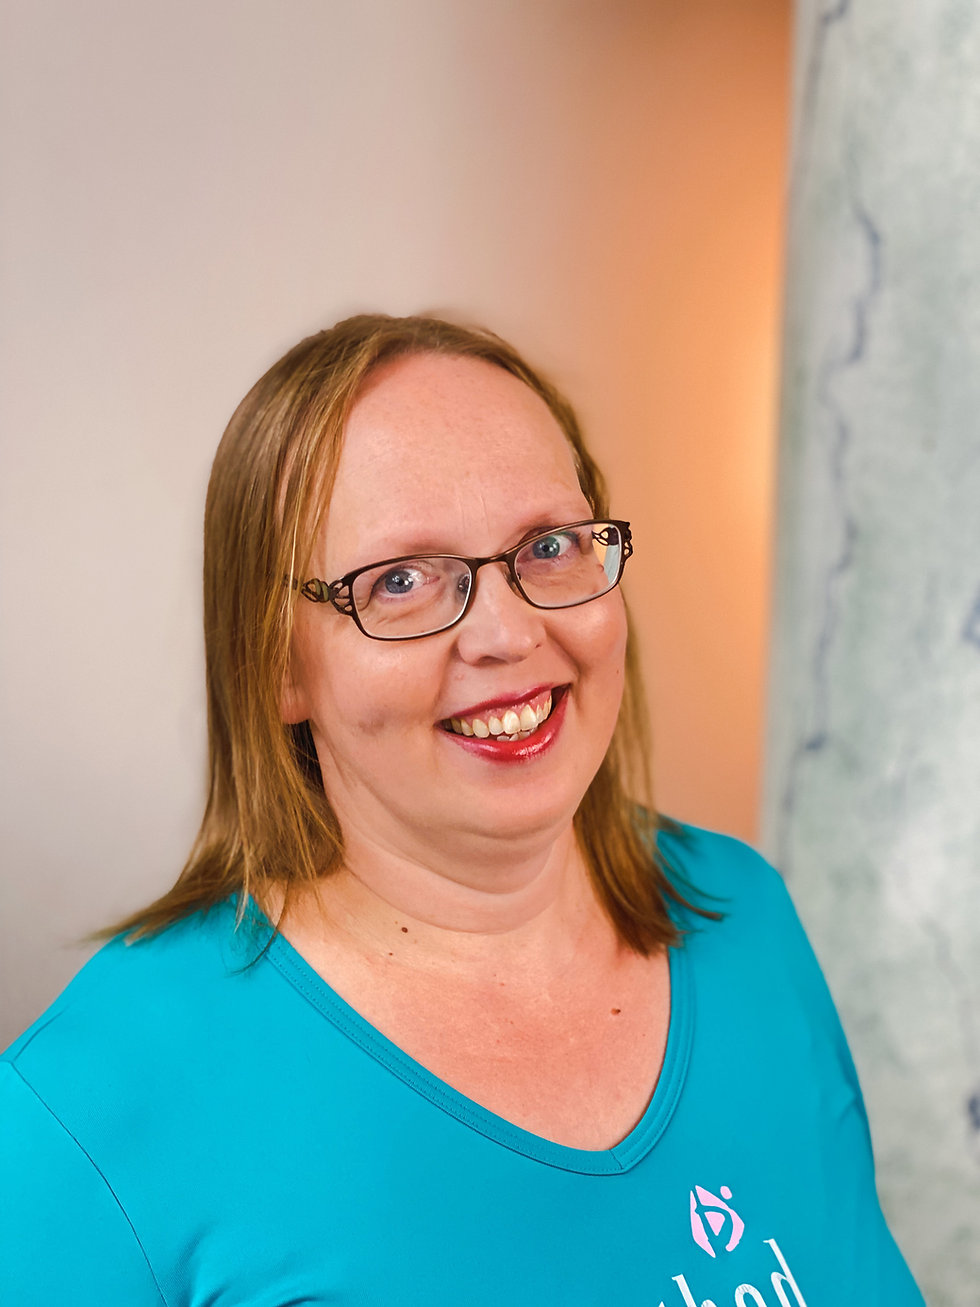 Riitta Rintamäki